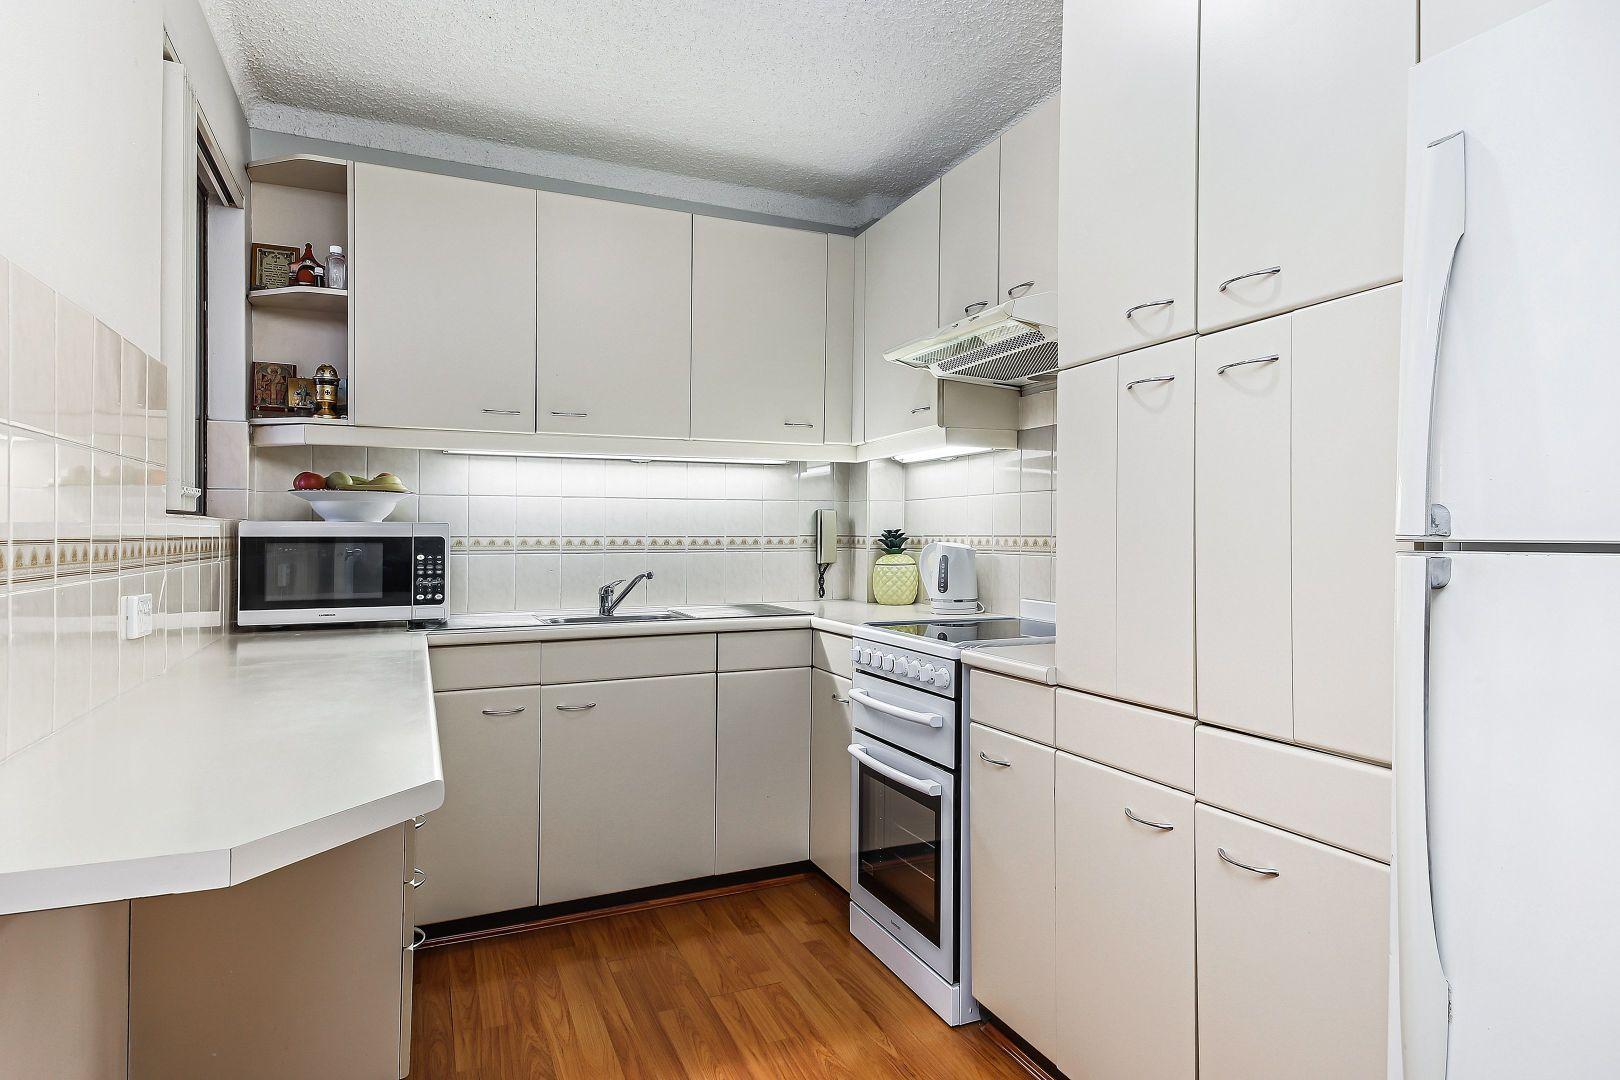 7/10-16 Hegerty Street, Rockdale NSW 2216, Image 2